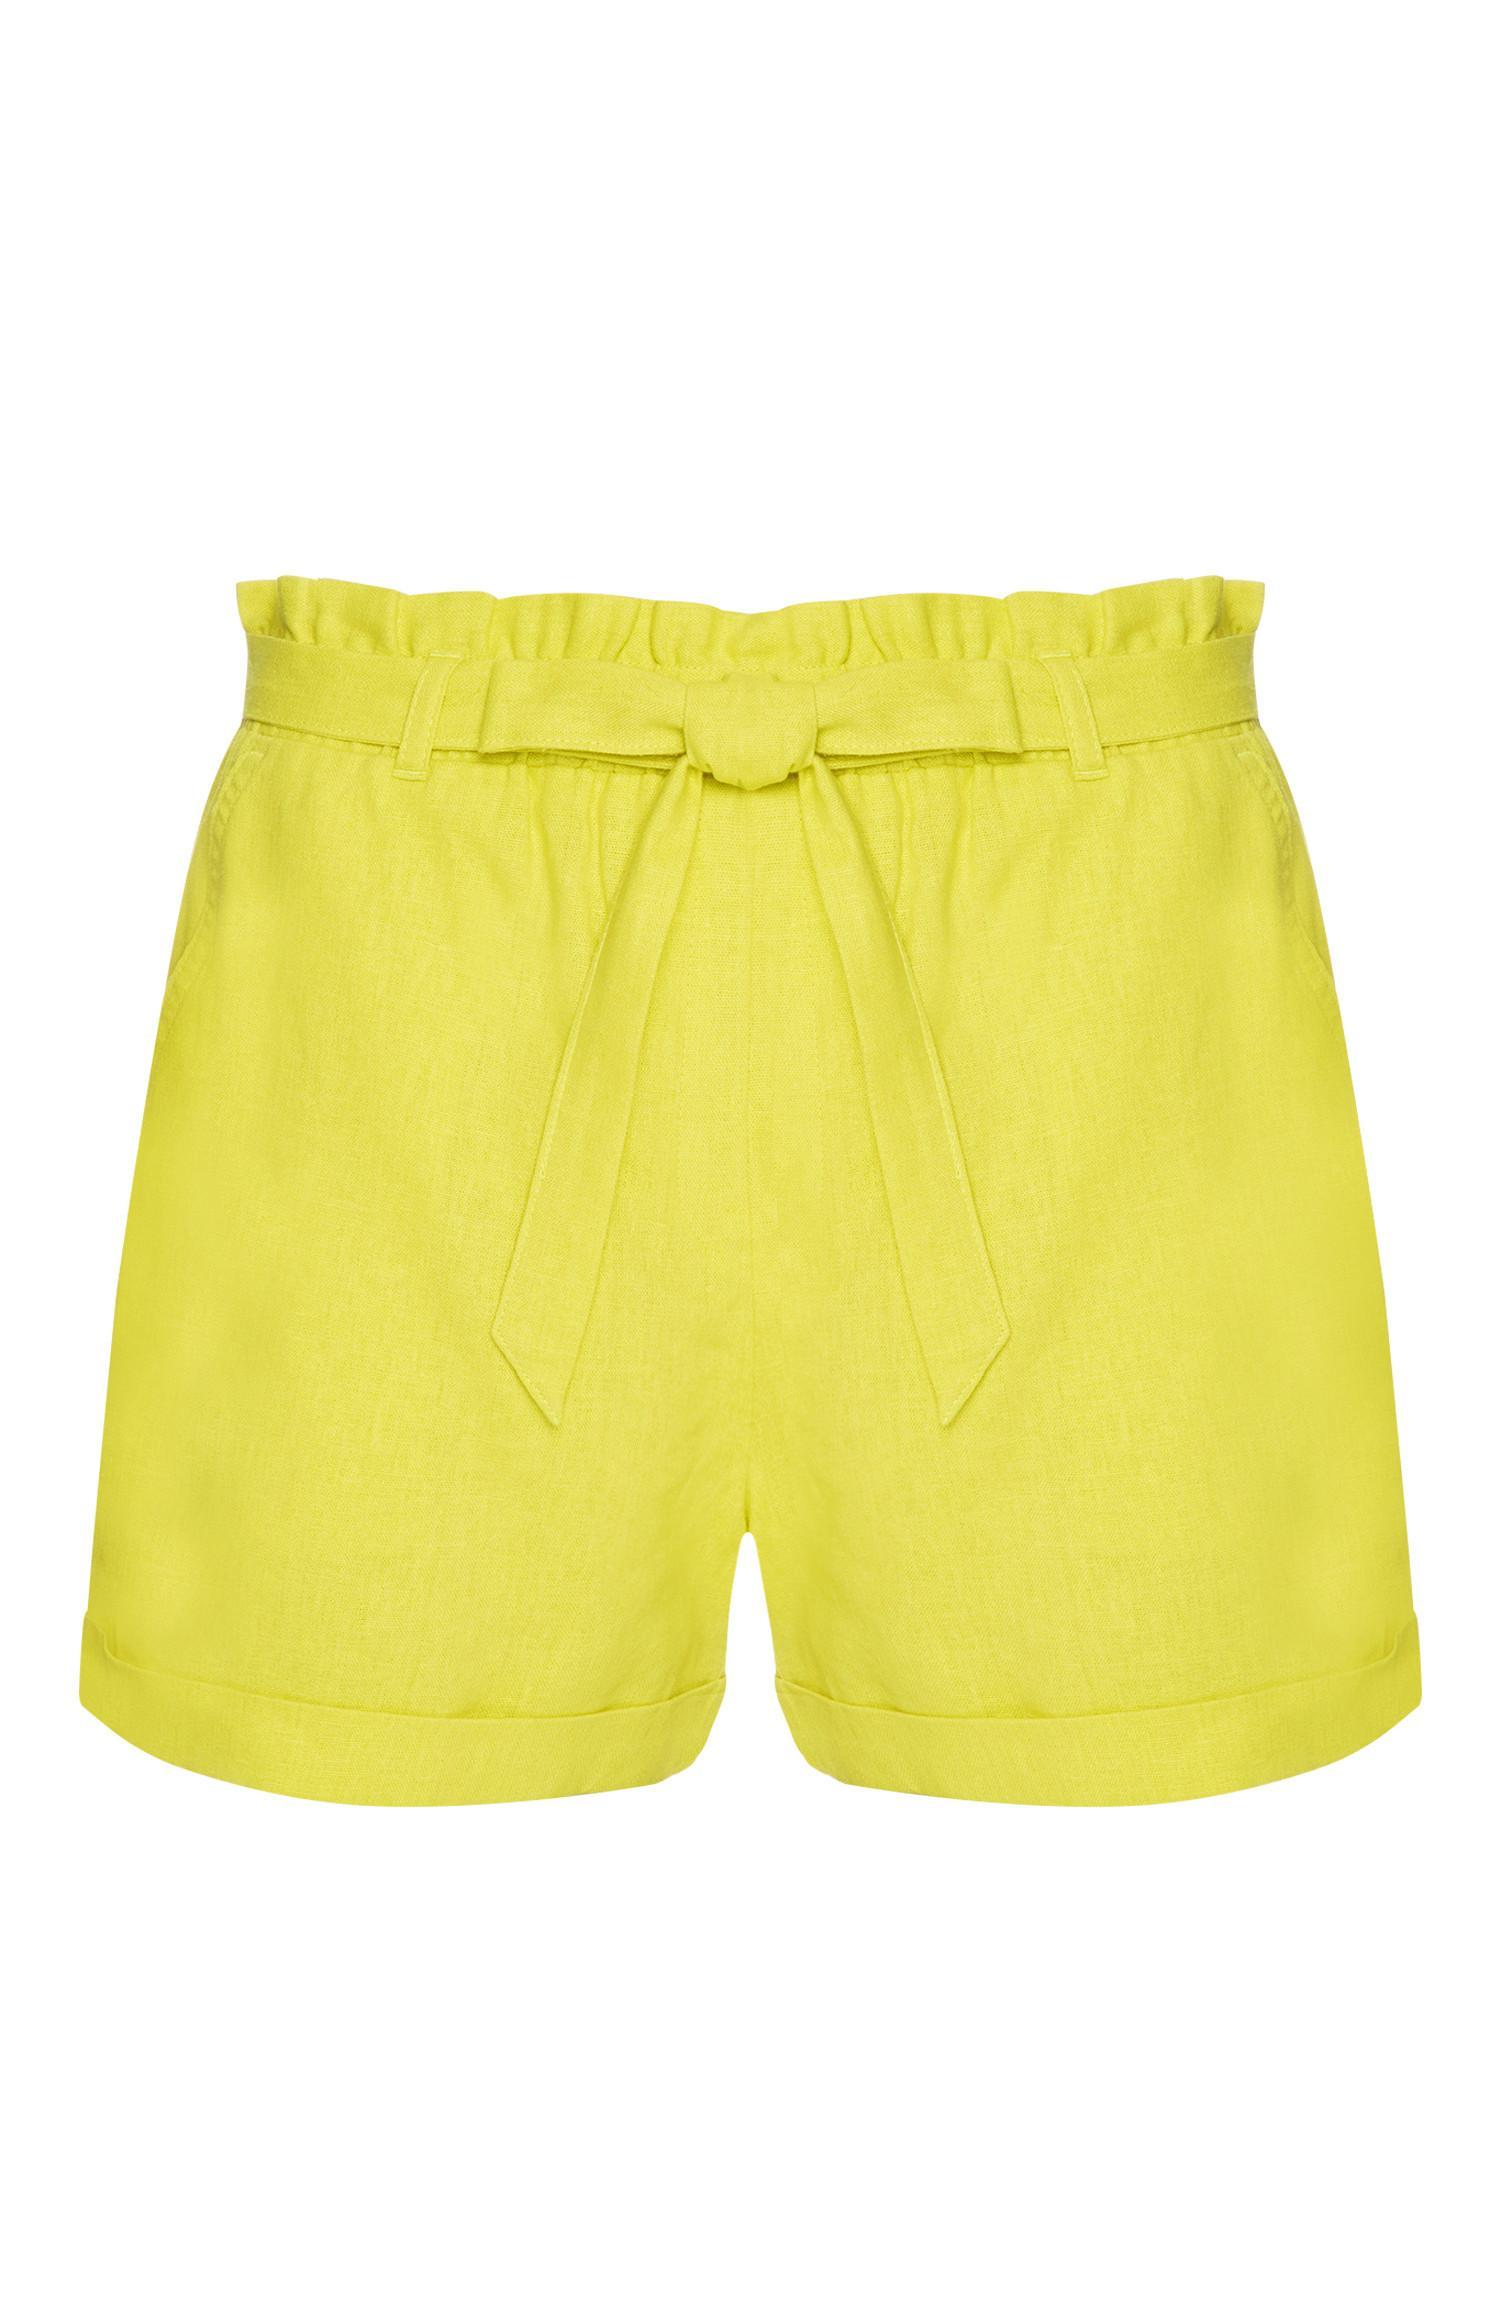 Lindgrüne Shorts mit Gürtel